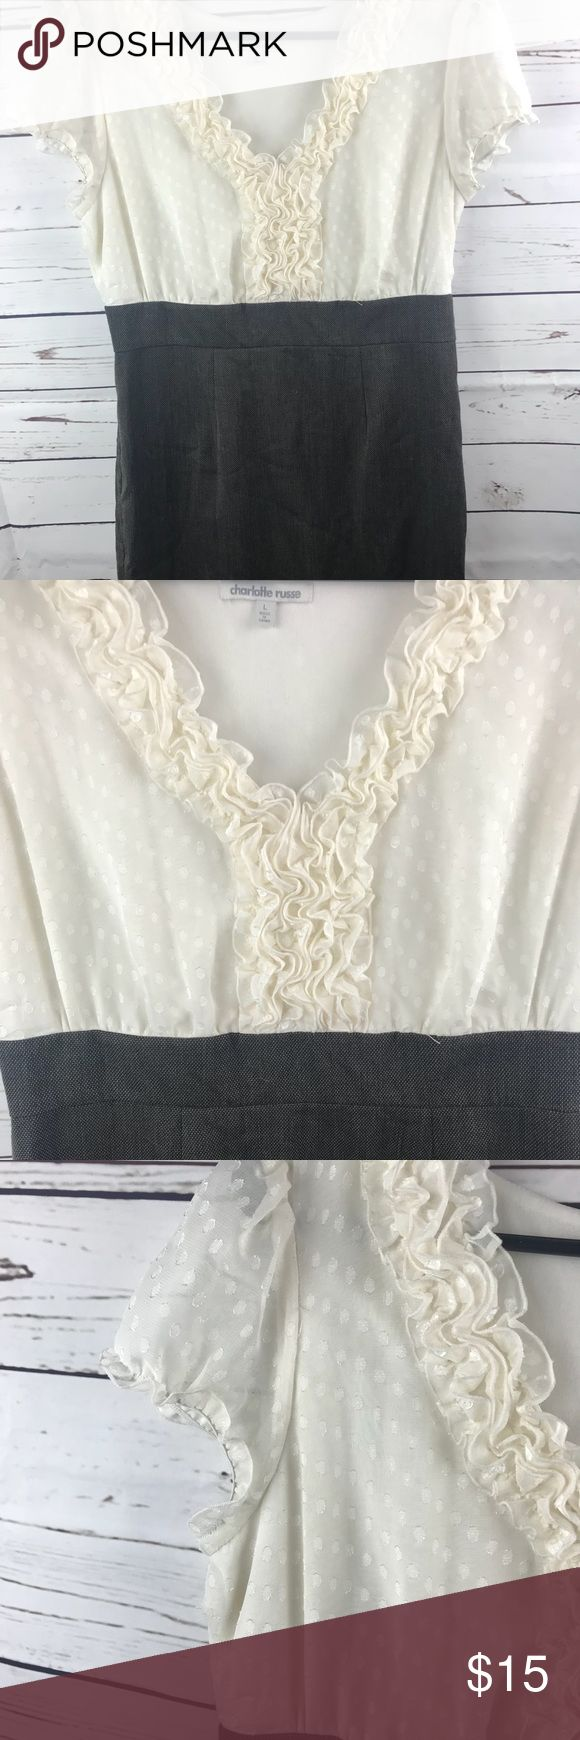 Charlotte Russe Dress Career Cream Grey Large Used good condition Charlotte Russe Dresses Midi